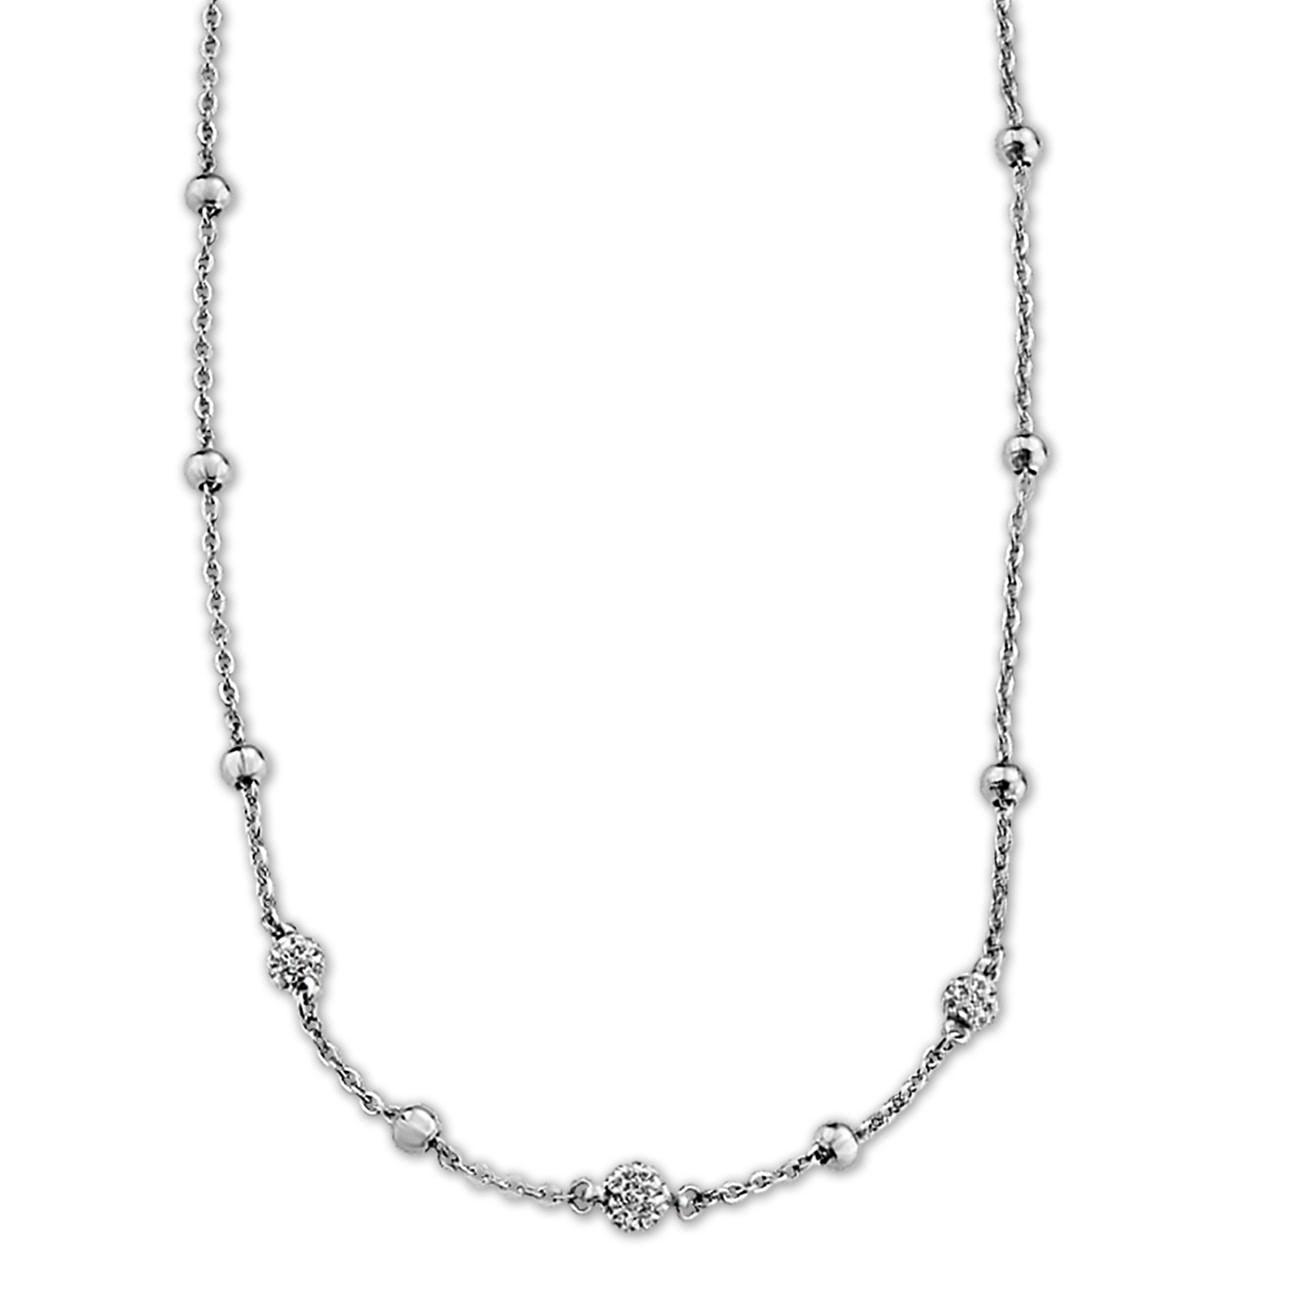 LOTUS Style Halskette Damen Edelstahl LS1763-1/1 Kugeln Schmuck JLS1763-1-1